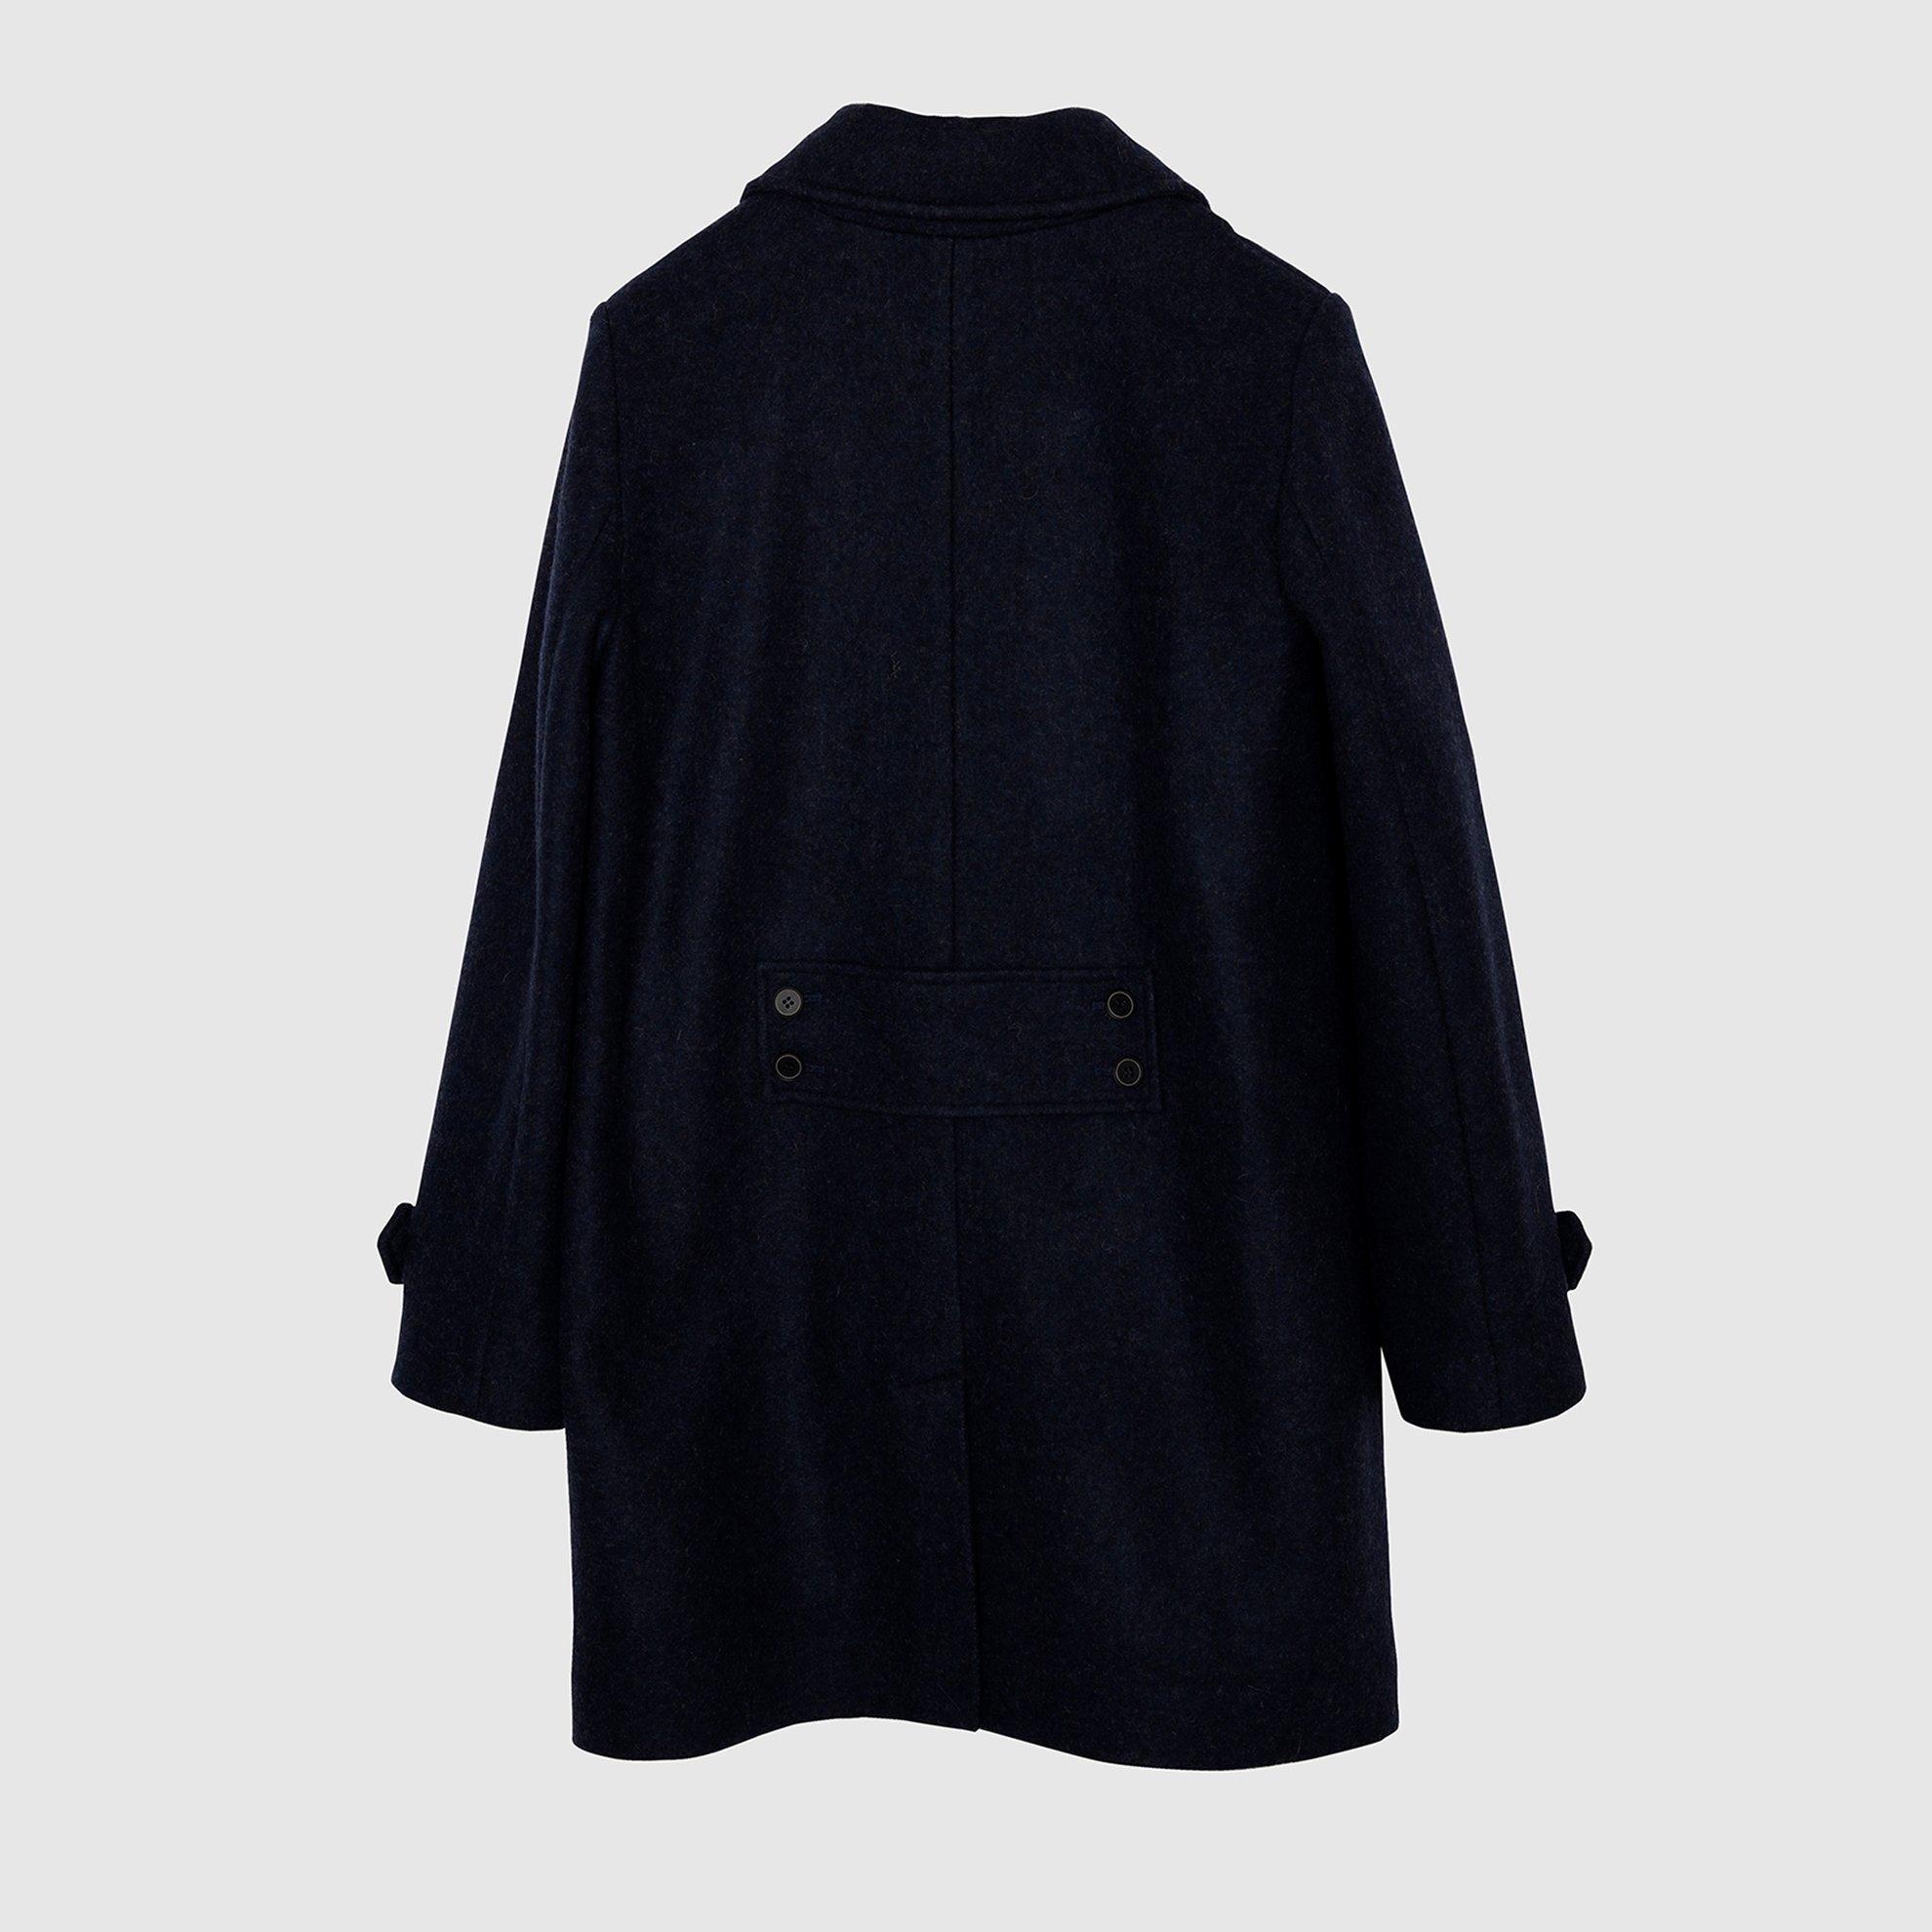 Cep Detaylı Palto